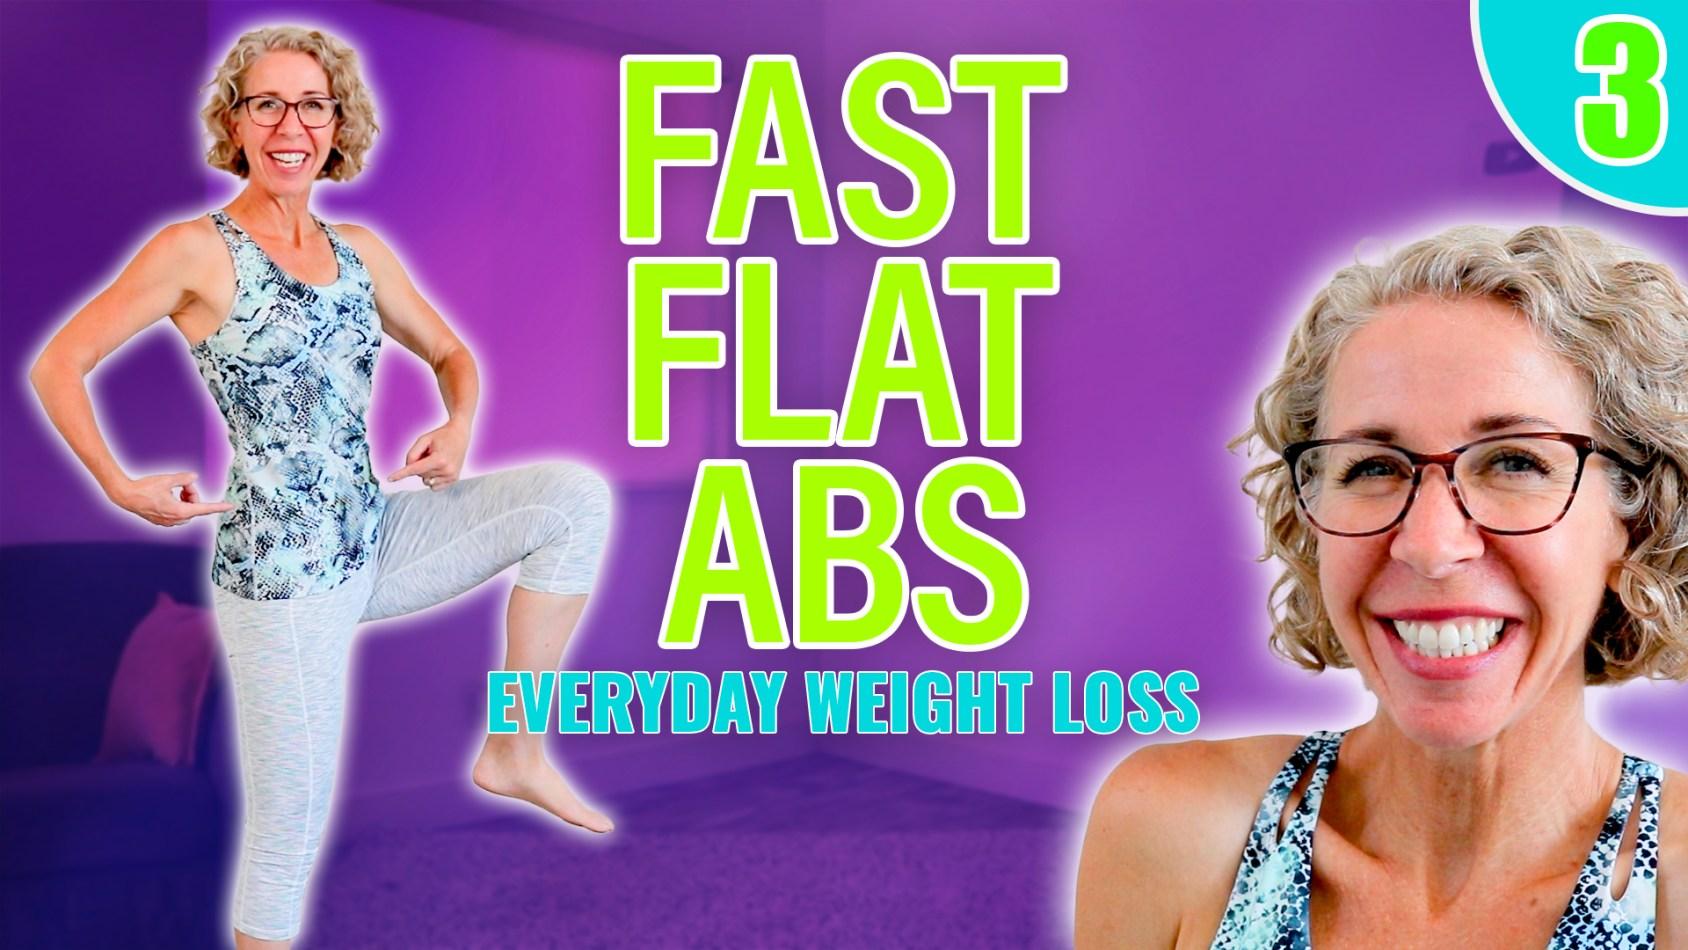 3️⃣ Your LEAN BODY over 50 Starts HERE! No Equipment, No Floor Work